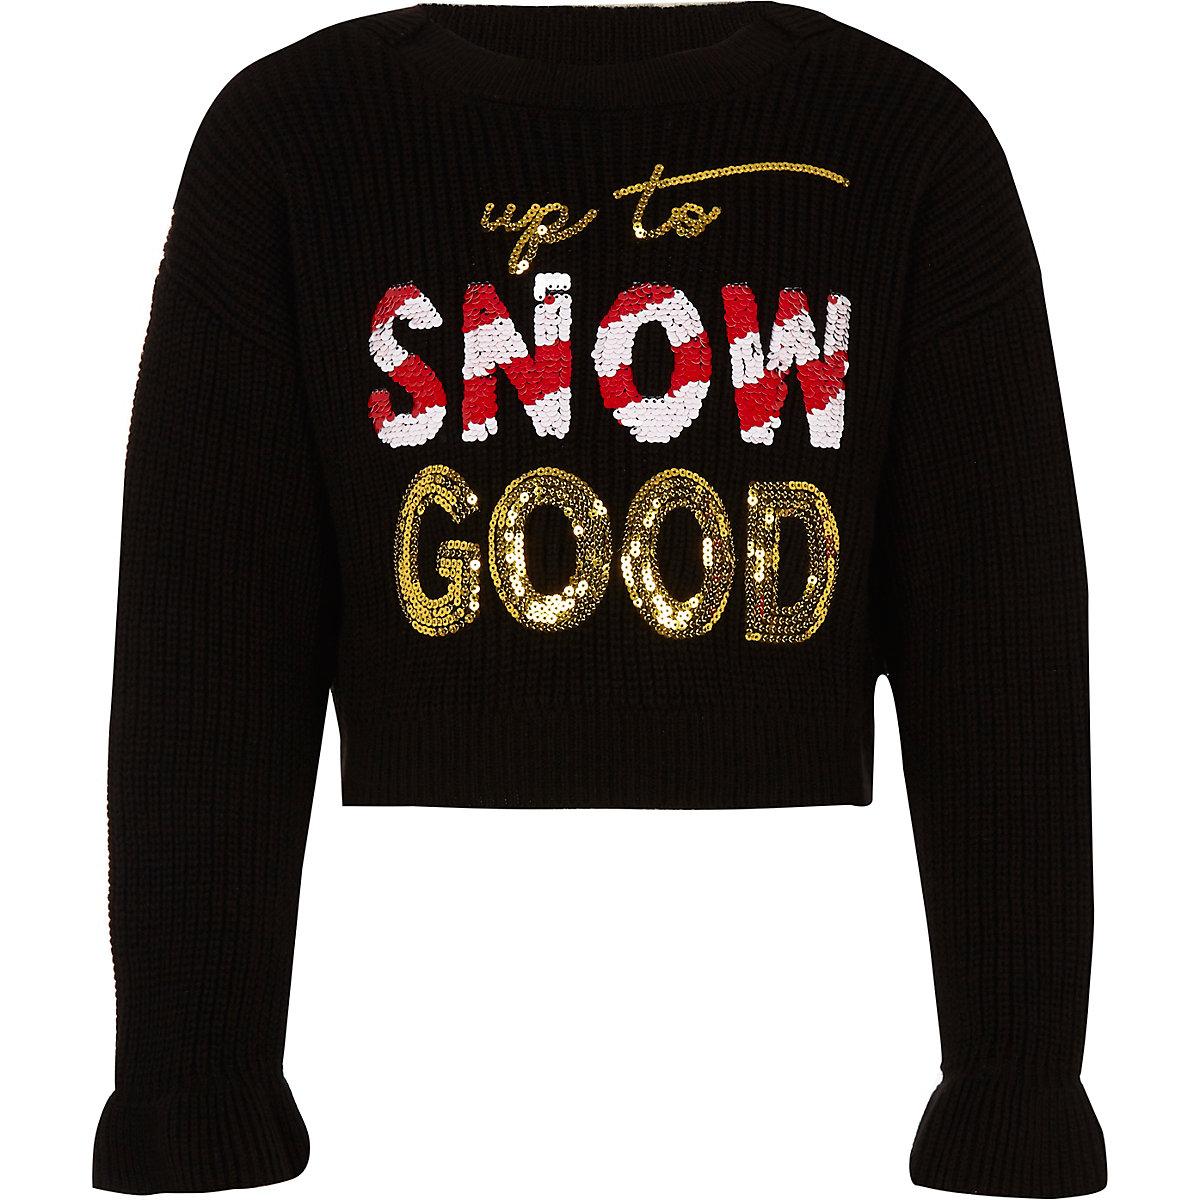 Girls black 'Snow good' Christmas sweater